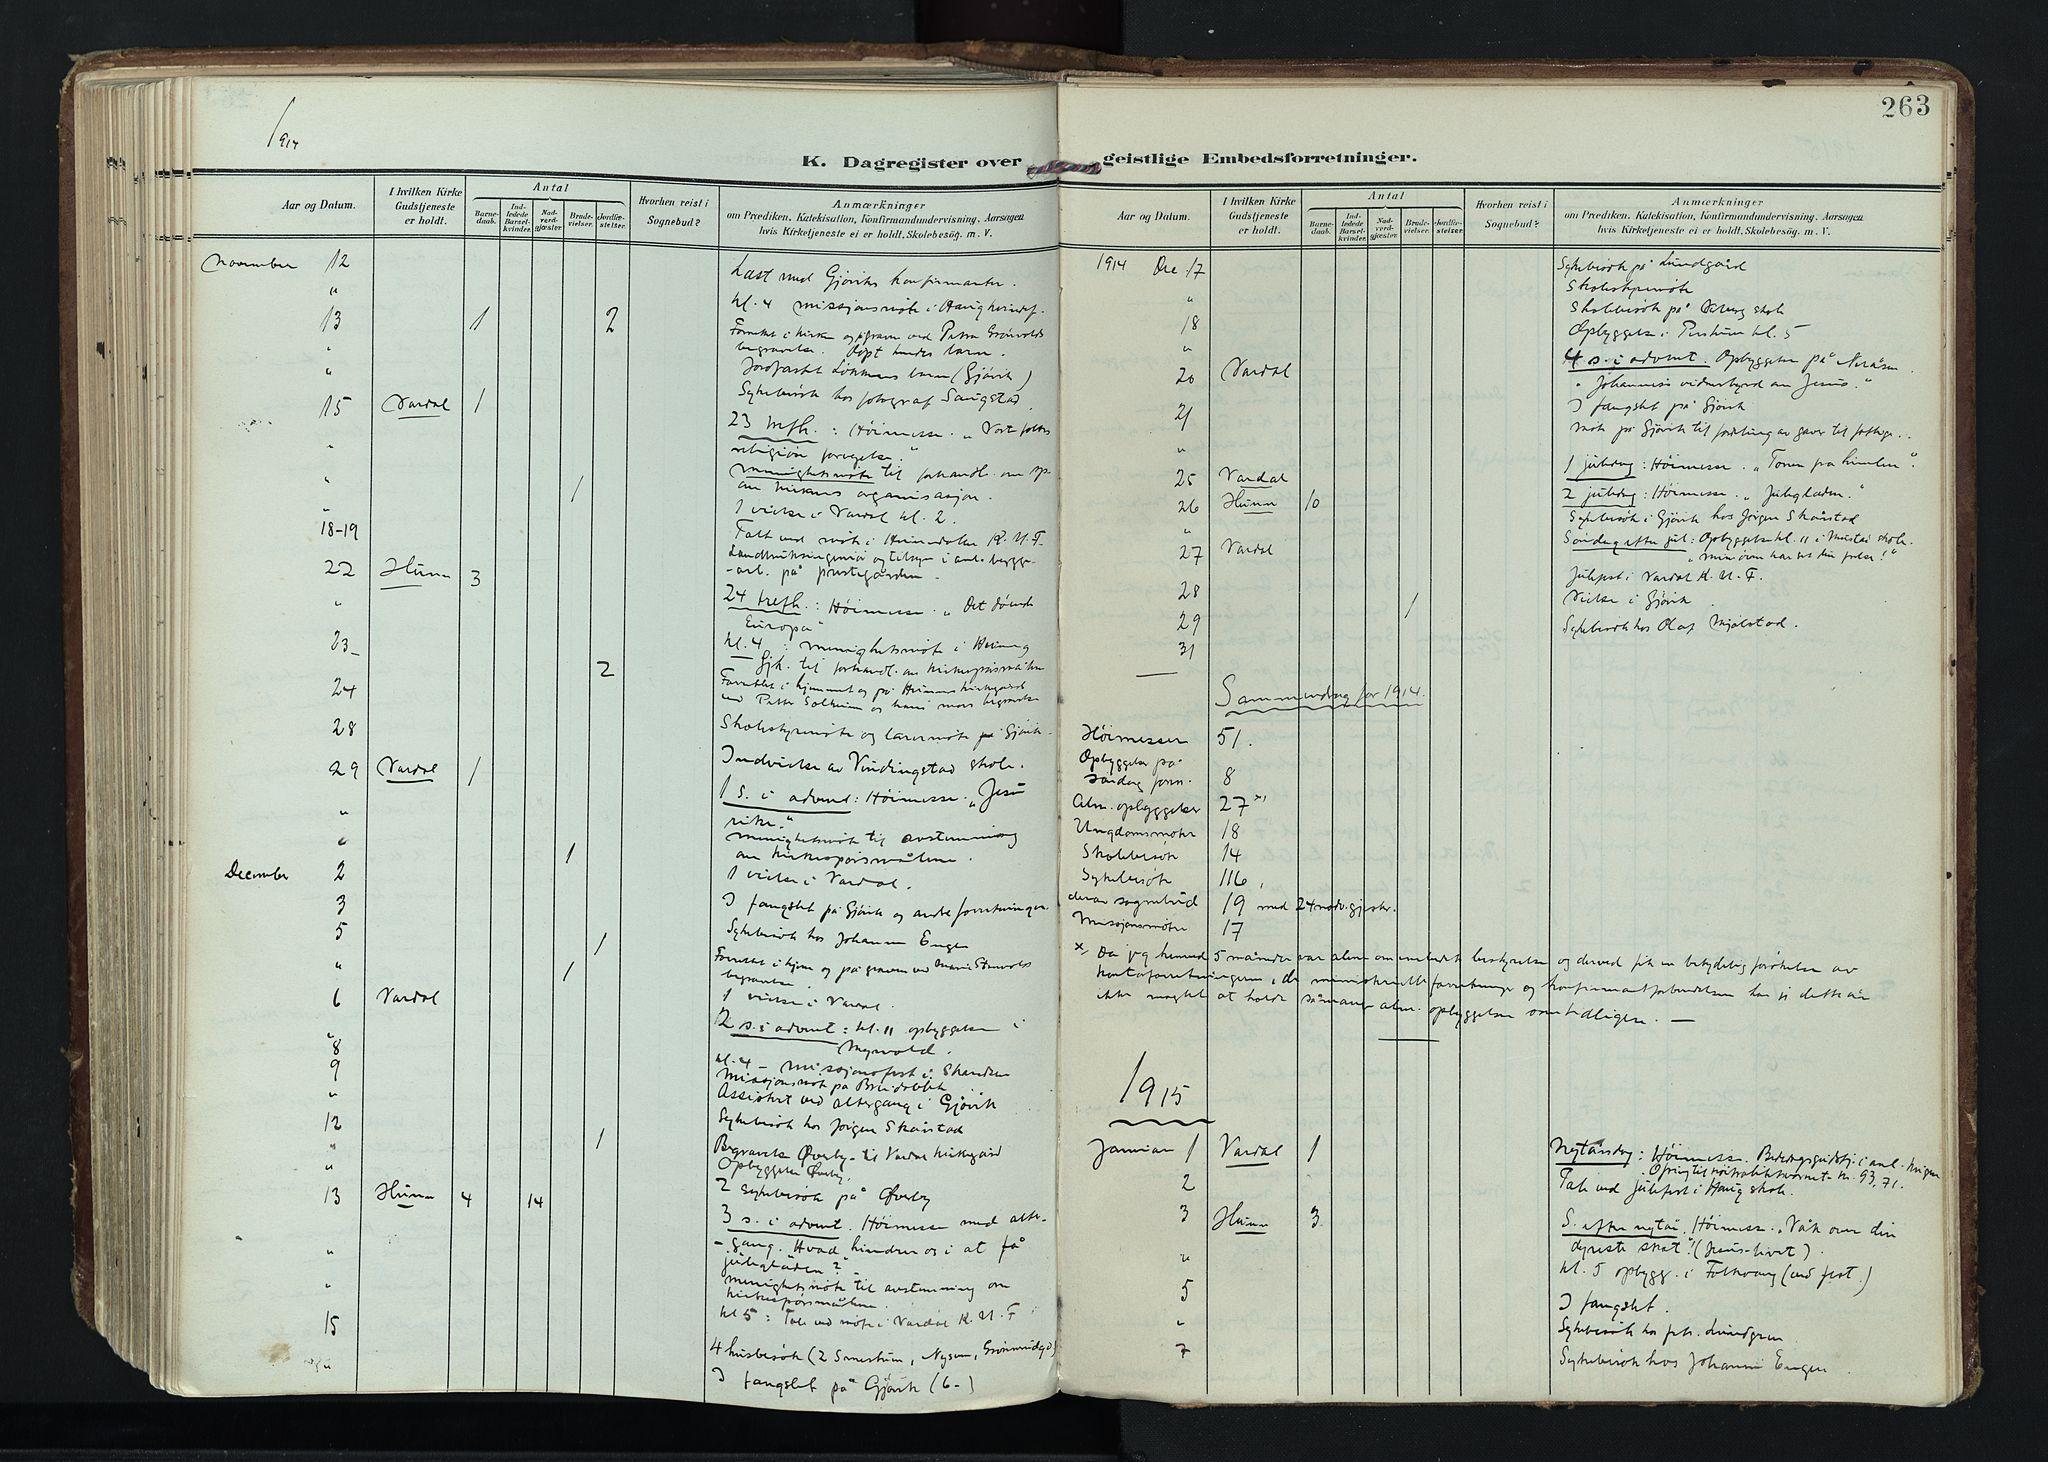 SAH, Vardal prestekontor, H/Ha/Haa/L0020: Ministerialbok nr. 20, 1907-1921, s. 263